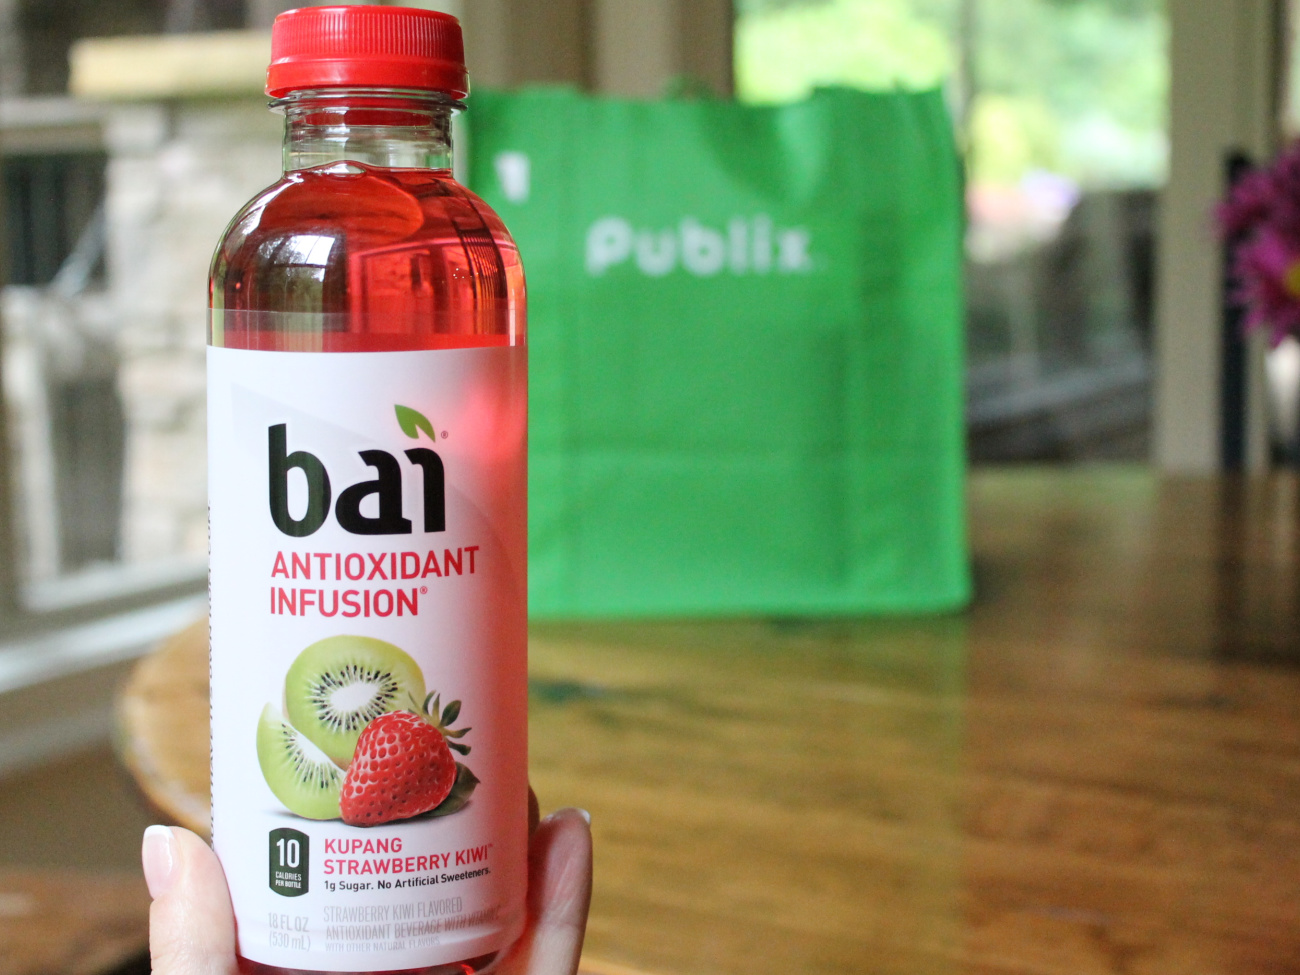 Grab A Bai Strawberry Kiwi For Free At Publix on I Heart Publix 1